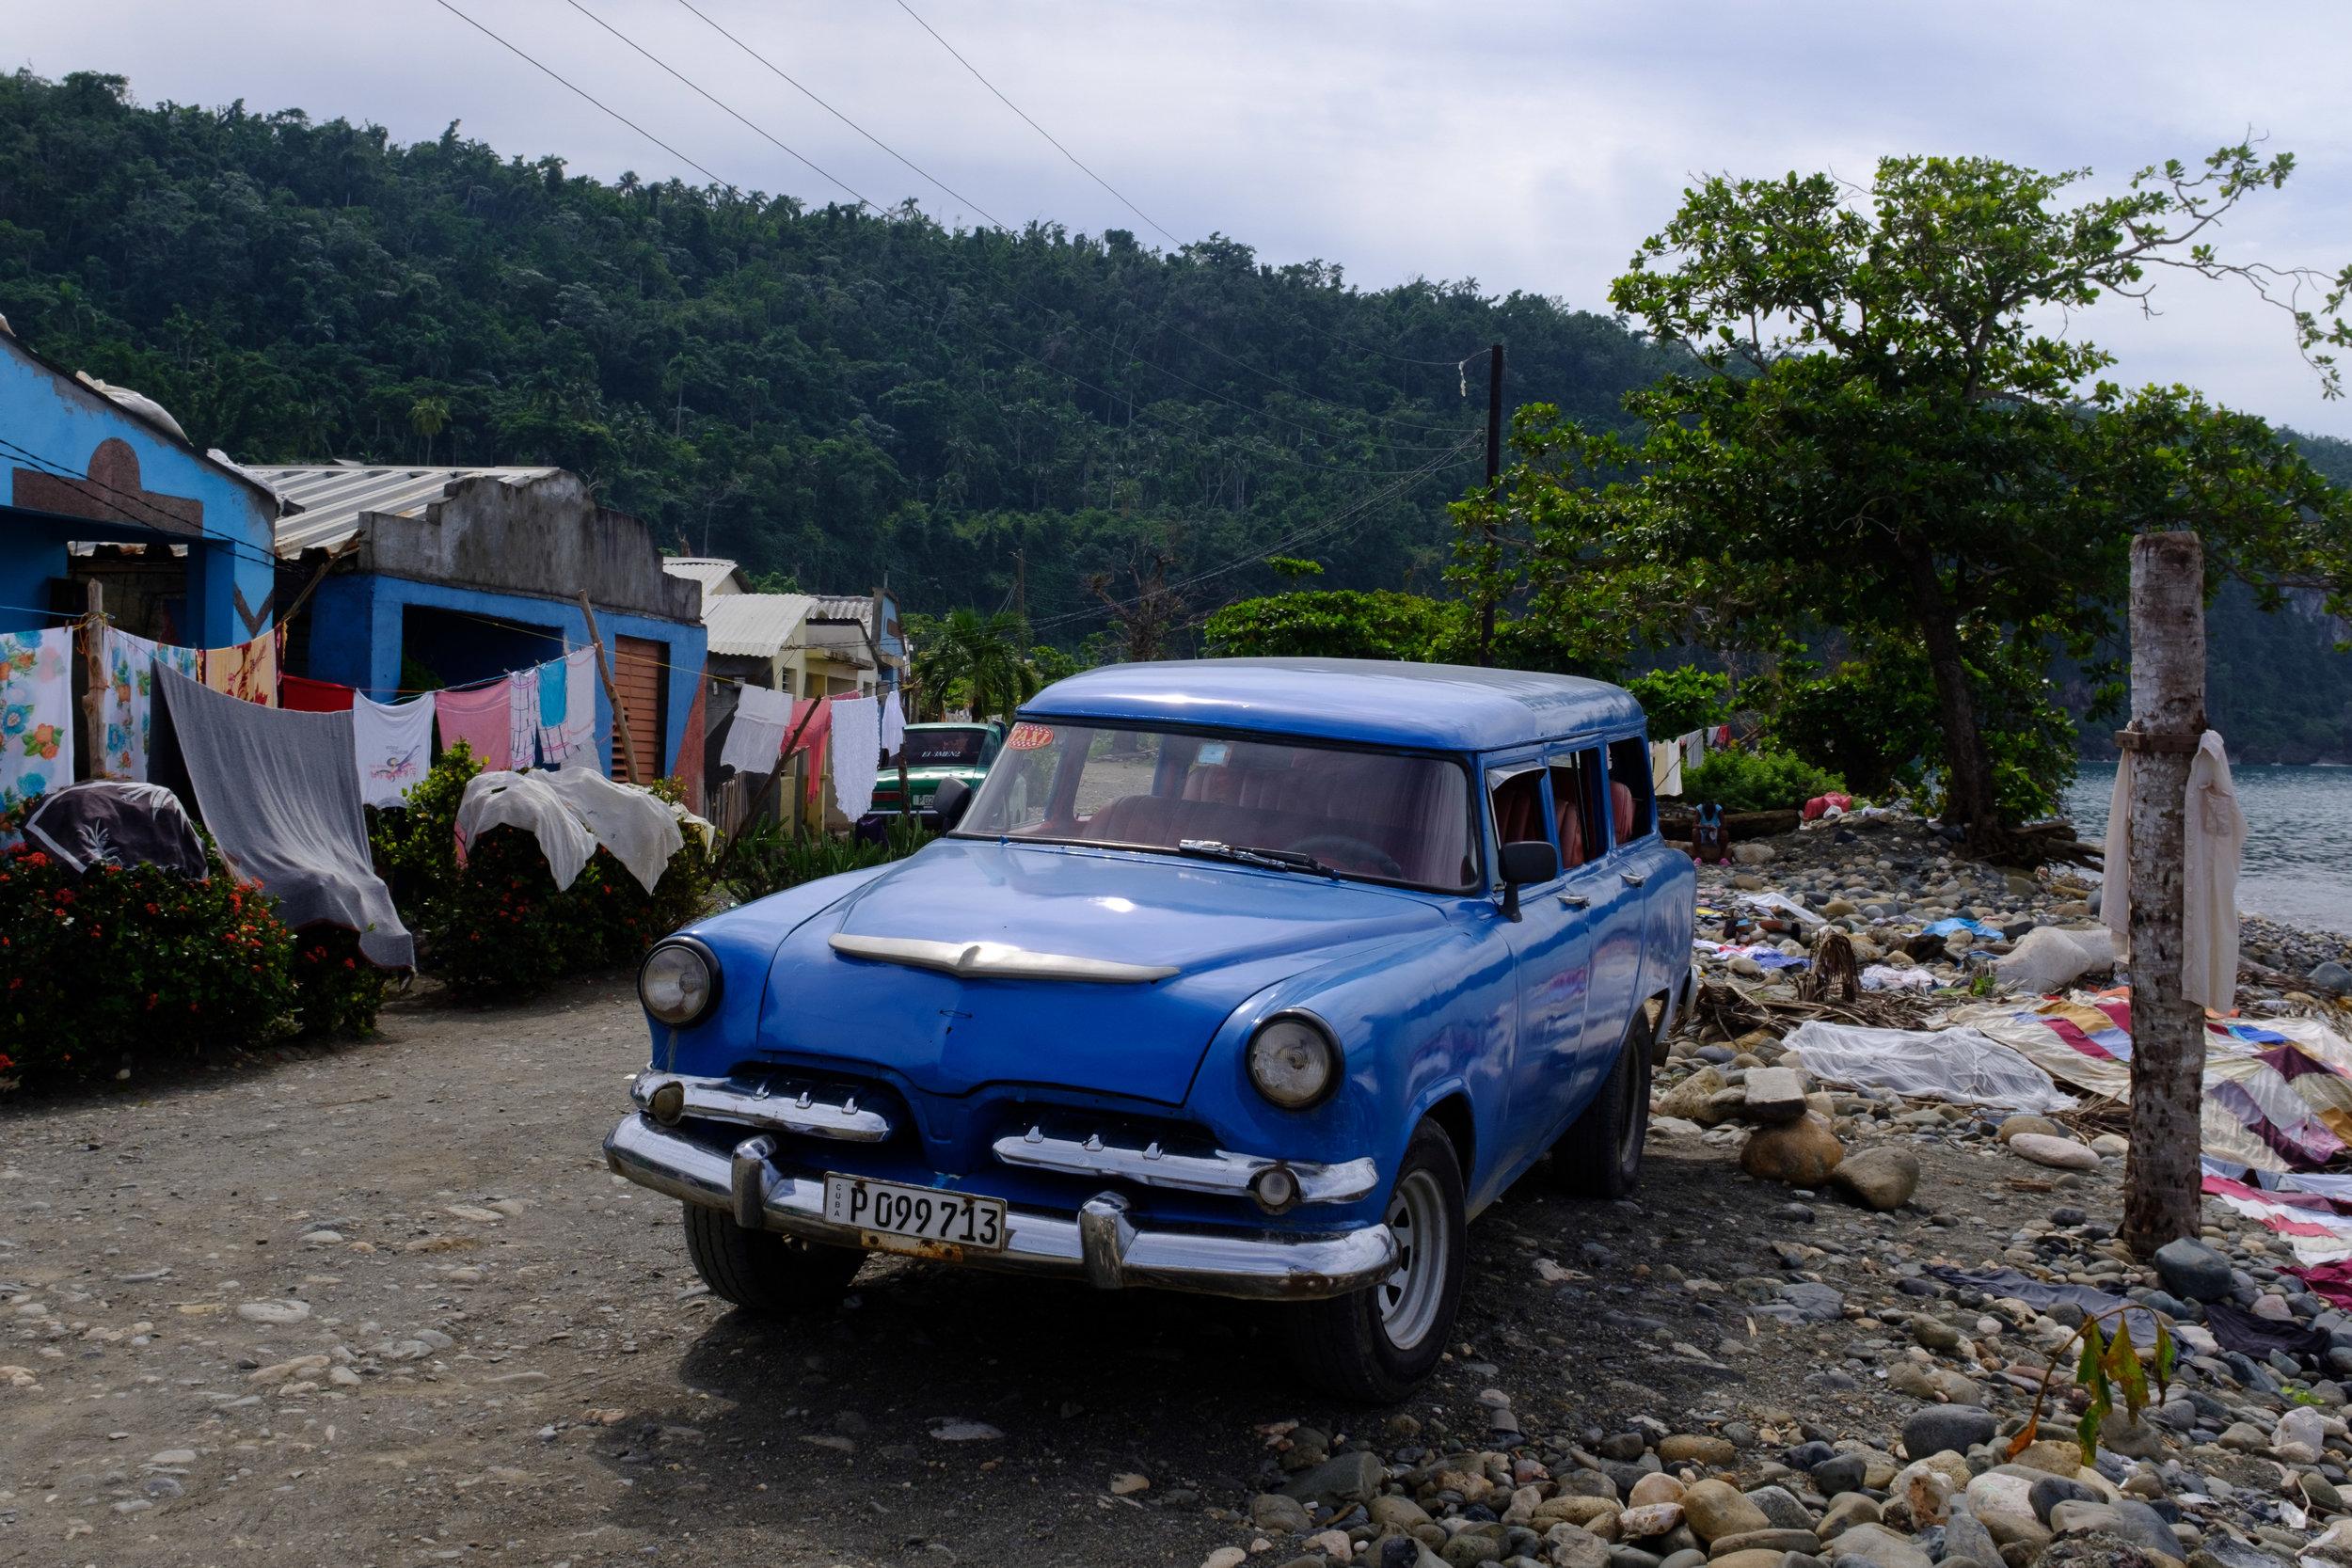 Near Baracoa - picture taken on Fuji X100F